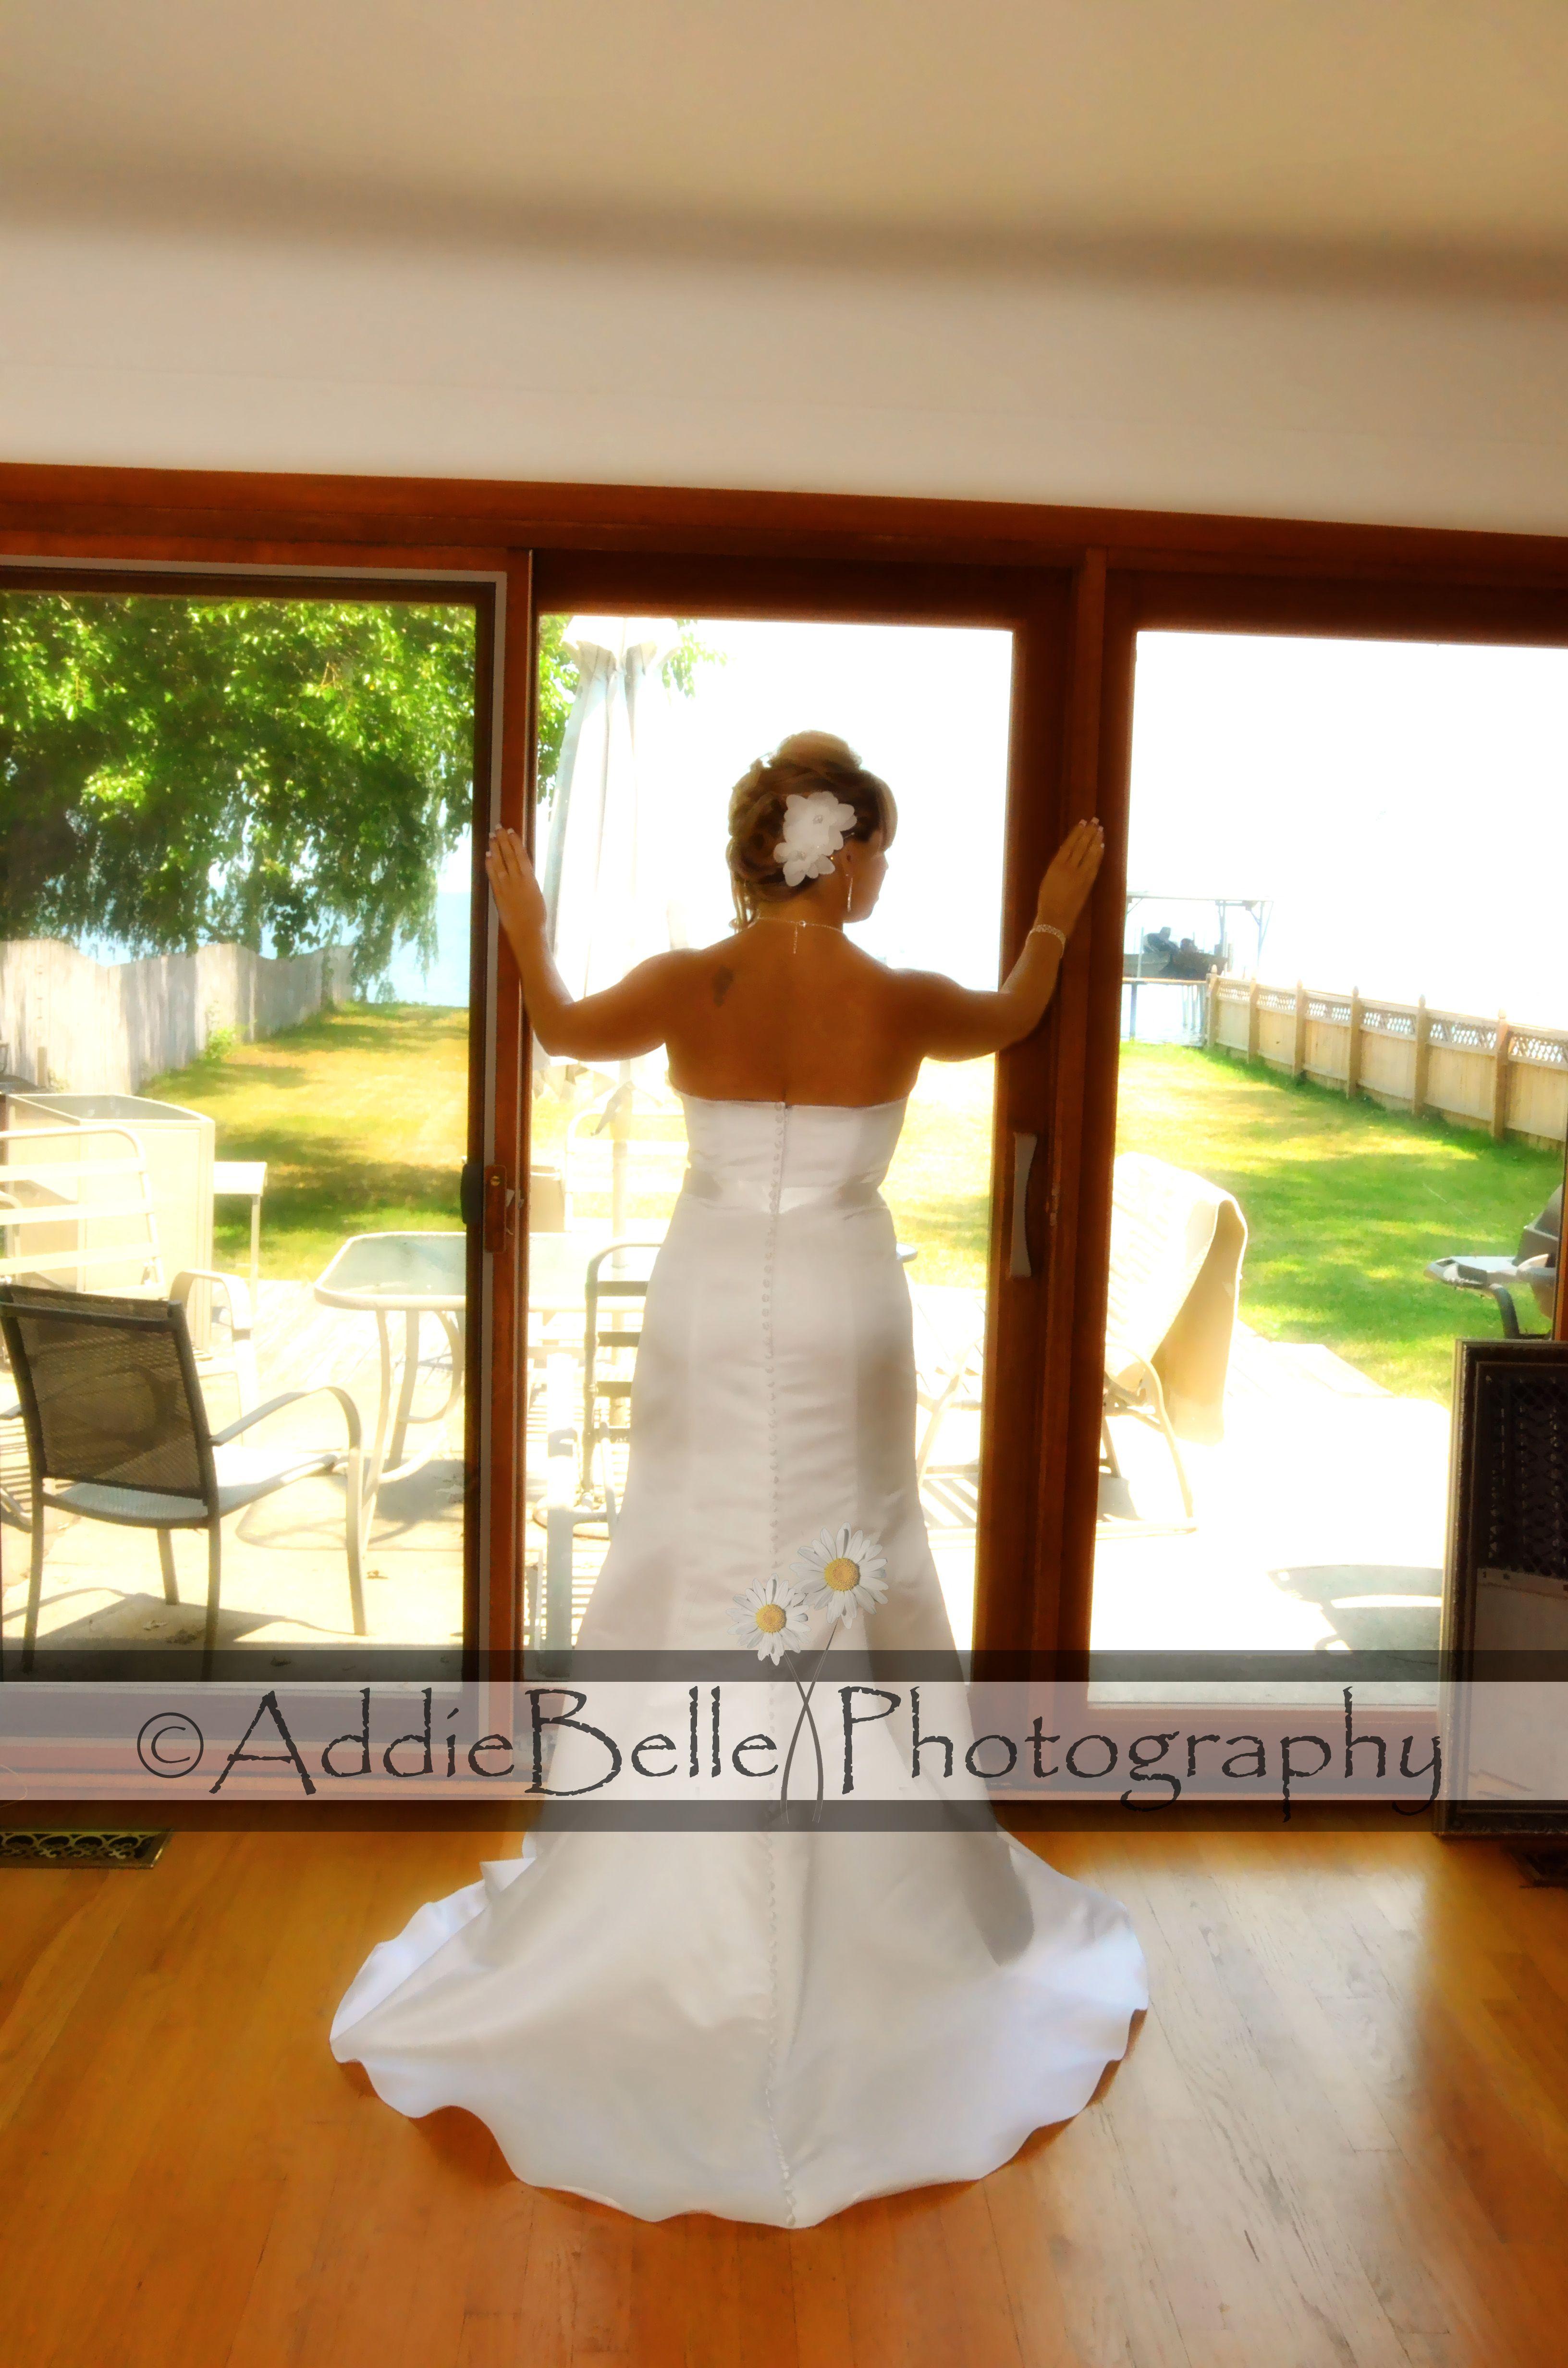 Wedding shot by AddieBelle Photography